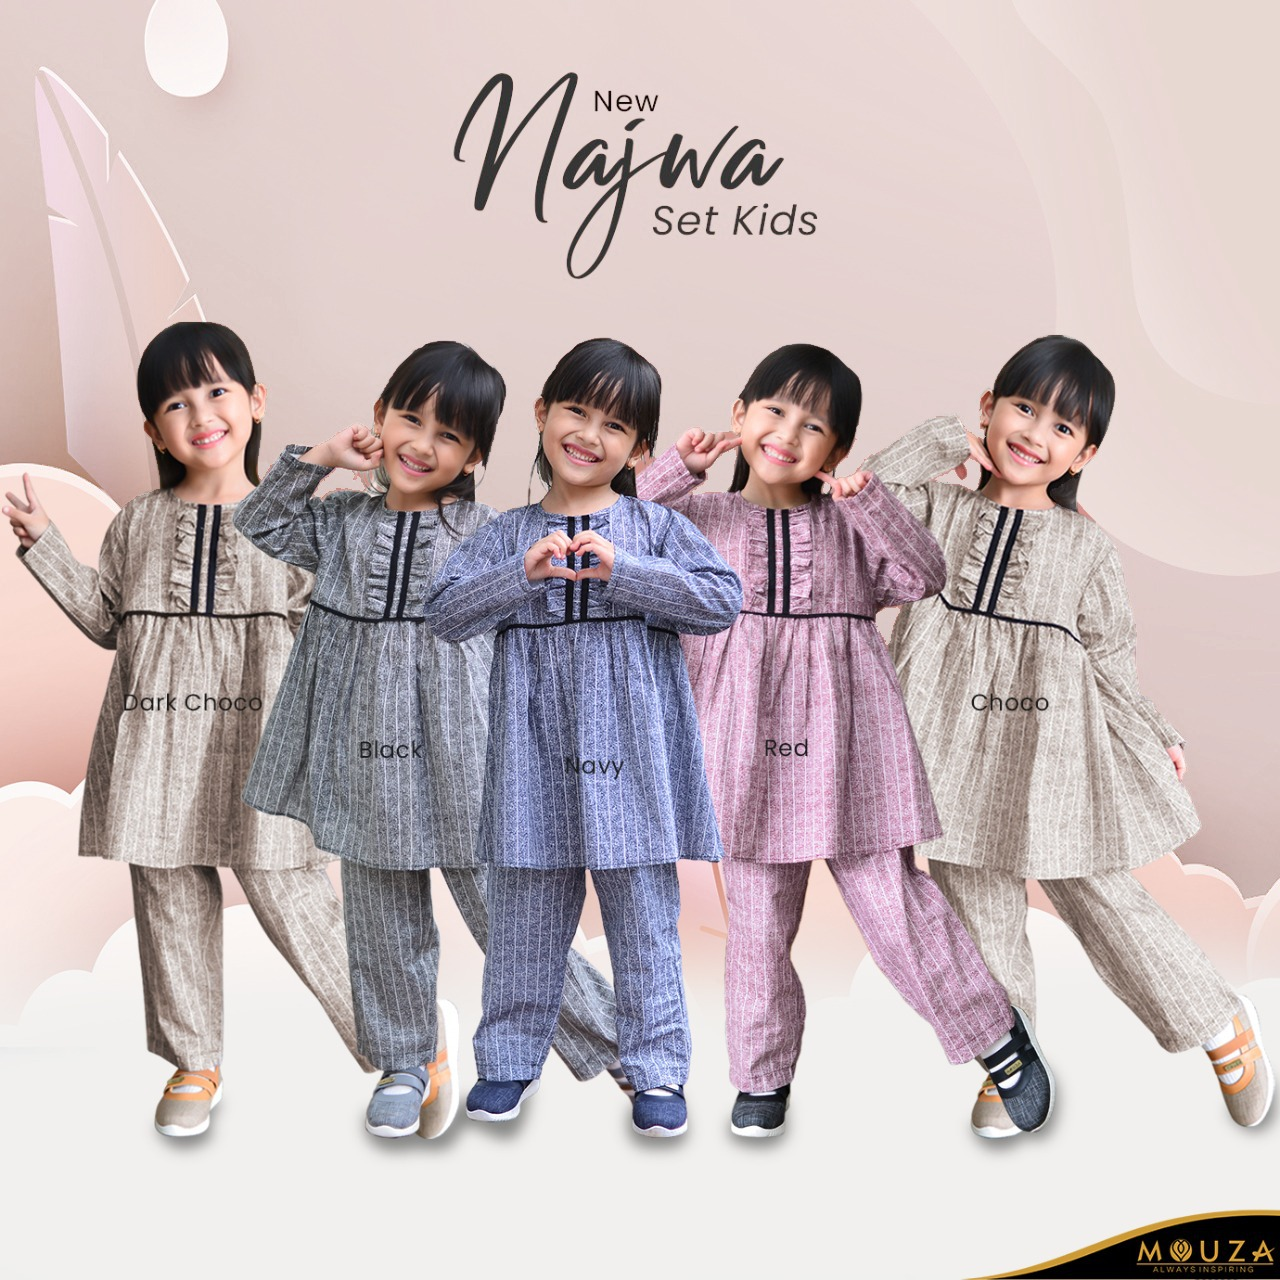 New Najwa Set Kids